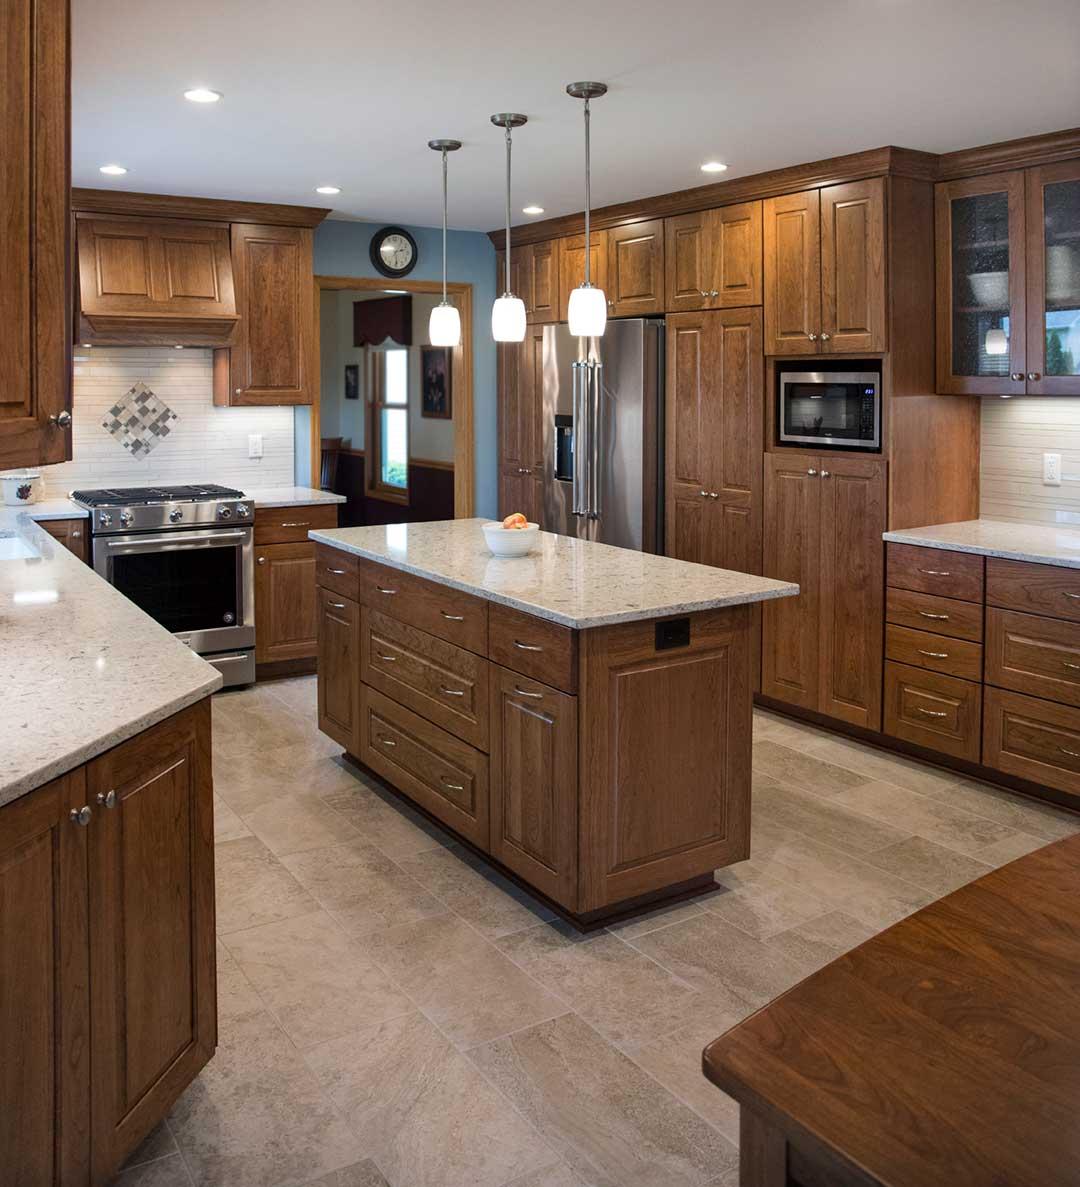 Fitchburg-WI-Transitional-Kitchen-Remodel-Side